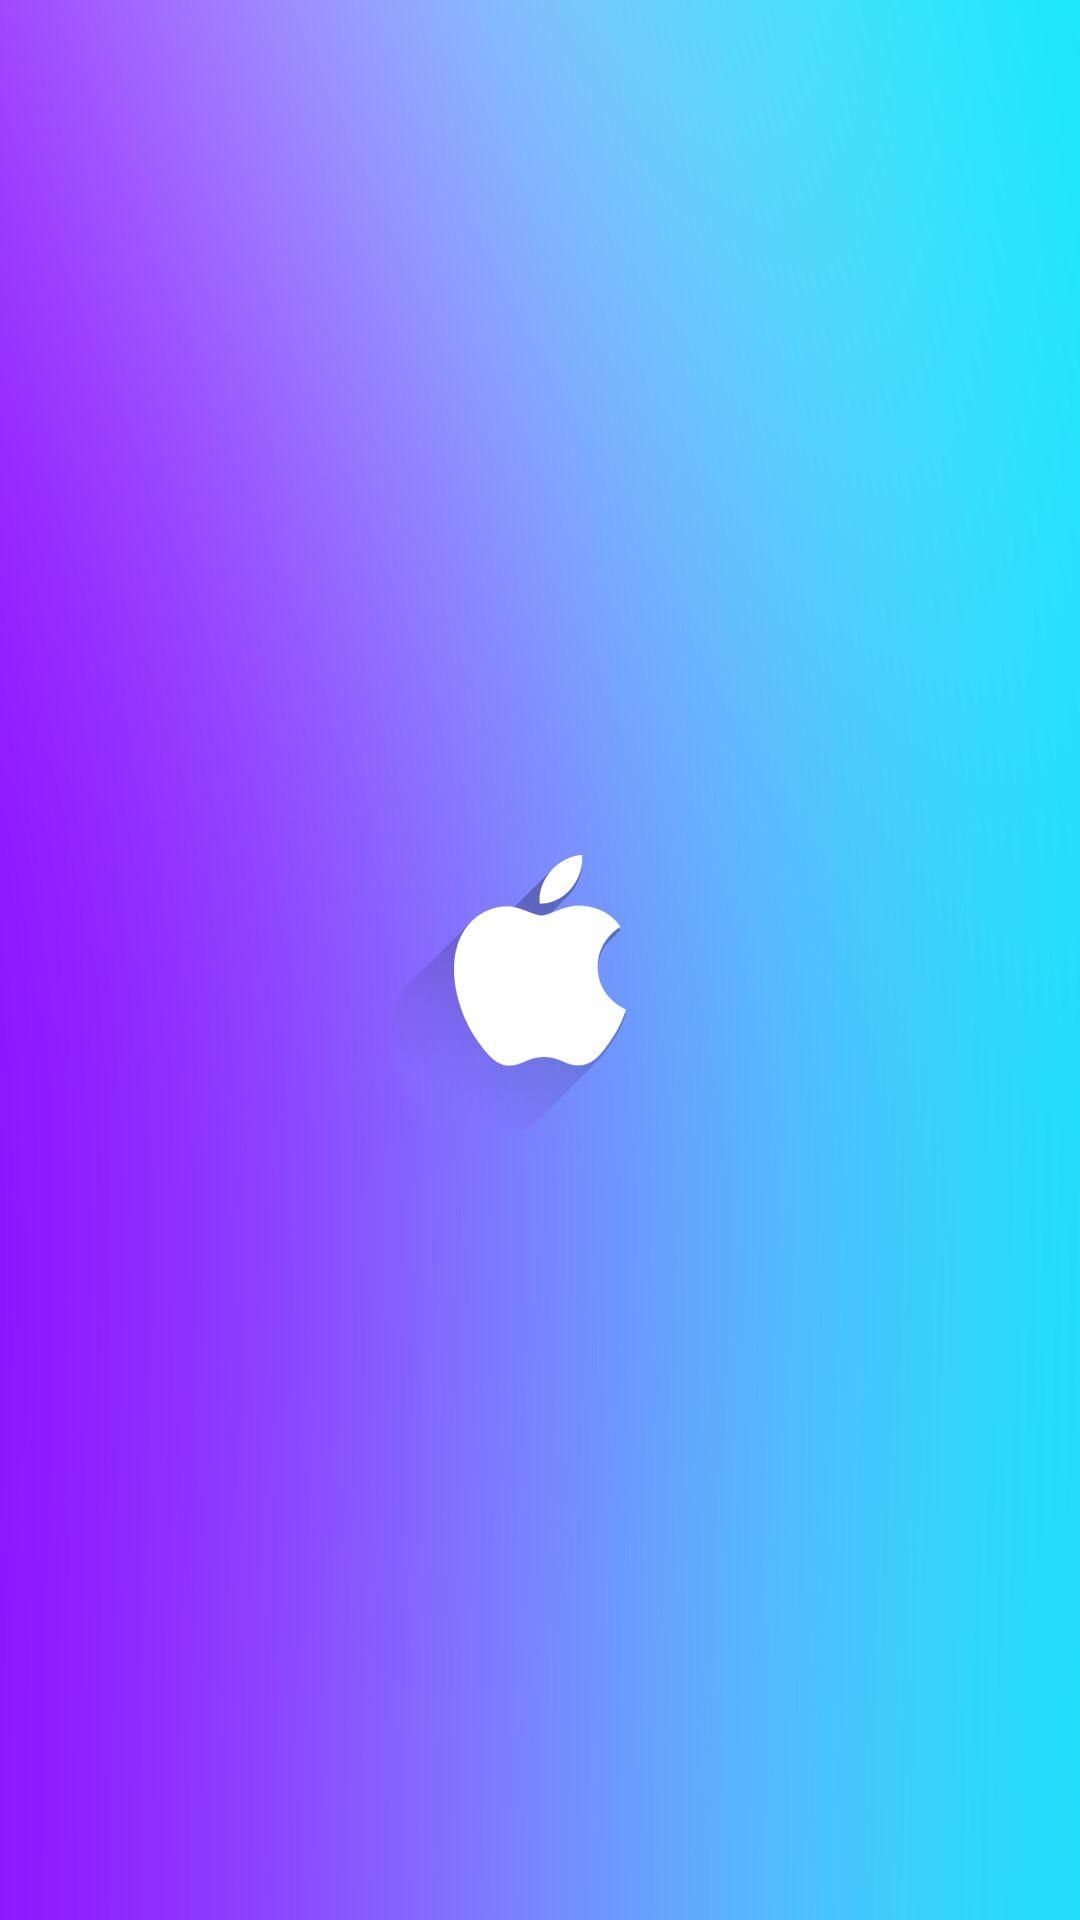 download Pin by Abhishek Bokey on AB in 2019 Apple logo 1080x1920